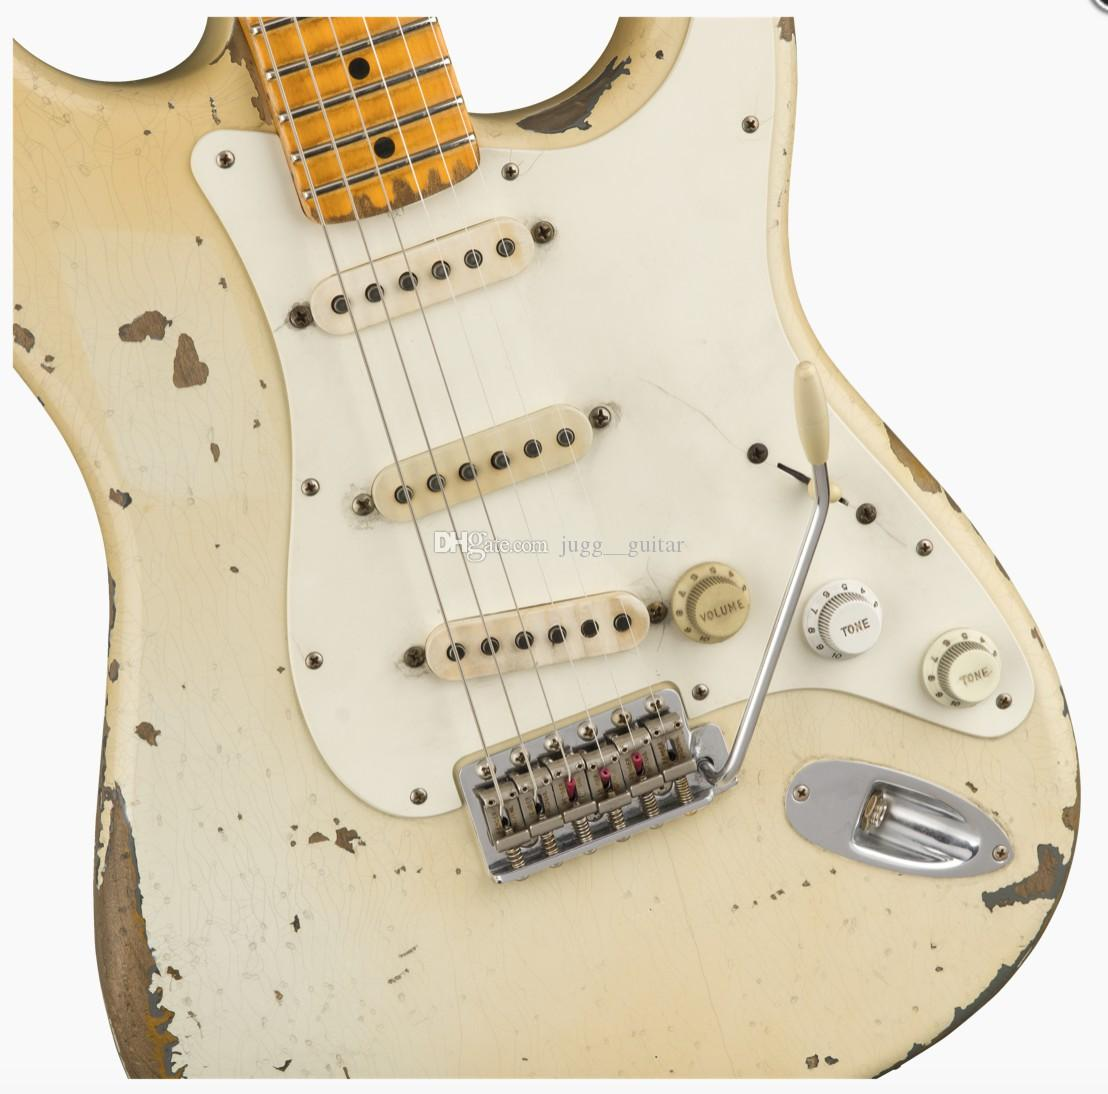 NAMM 10s Custom Shop Masterbuilt John Cruz Limited Edition Jimmie Vaughan Aged Olympic White ST lourd Relic Guitare électrique Vintage Tuners